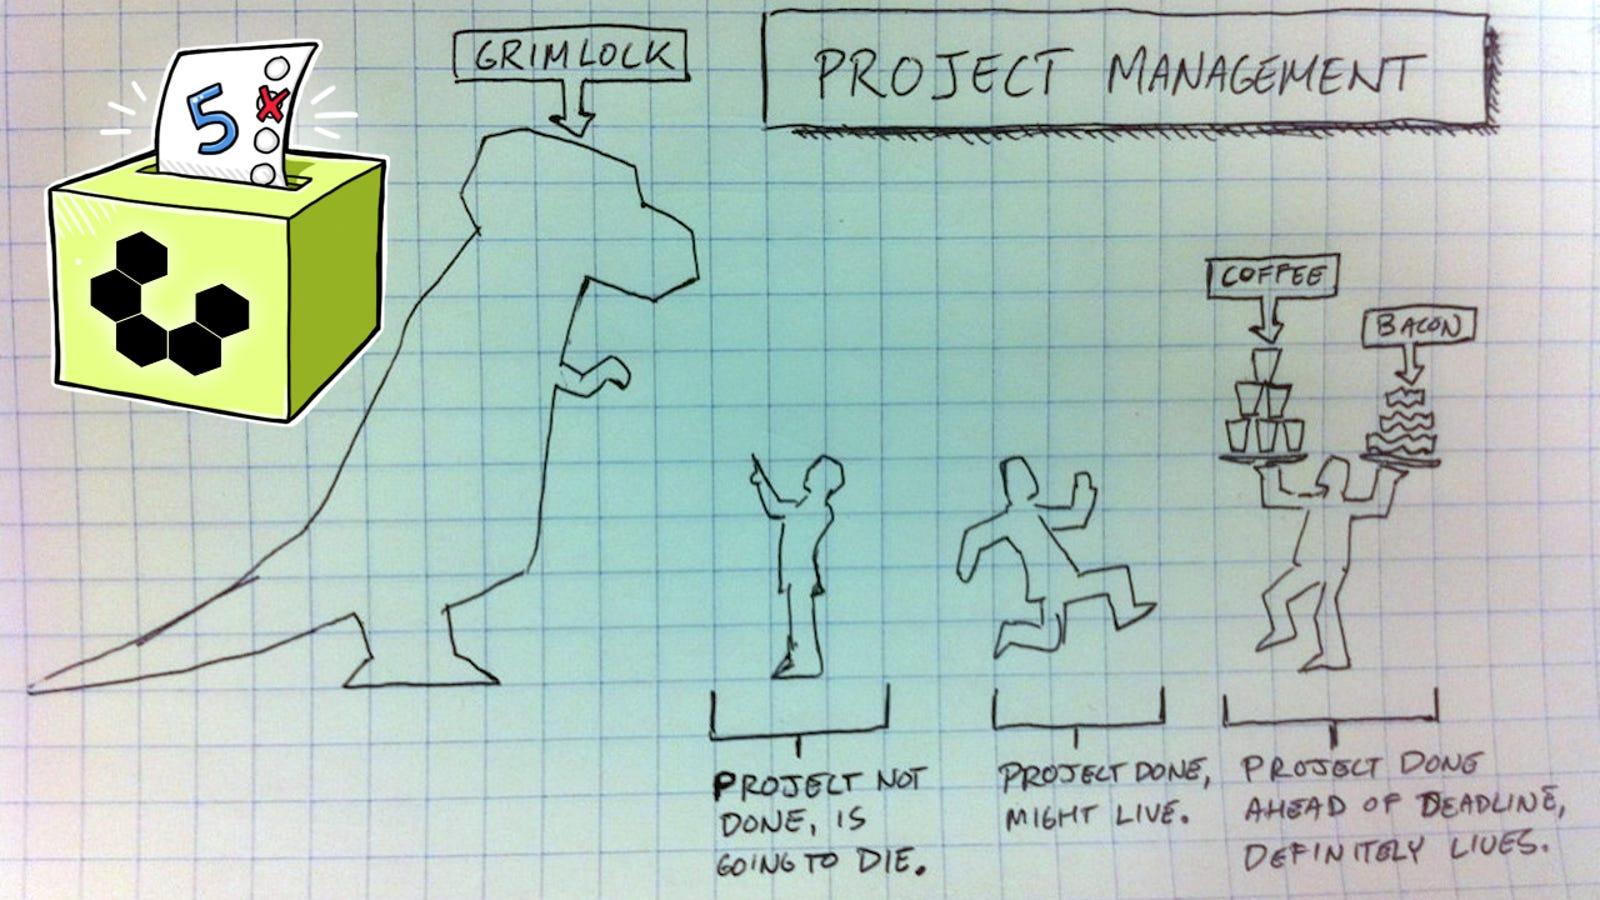 Project Management: Five Best Personal Project Management Tools